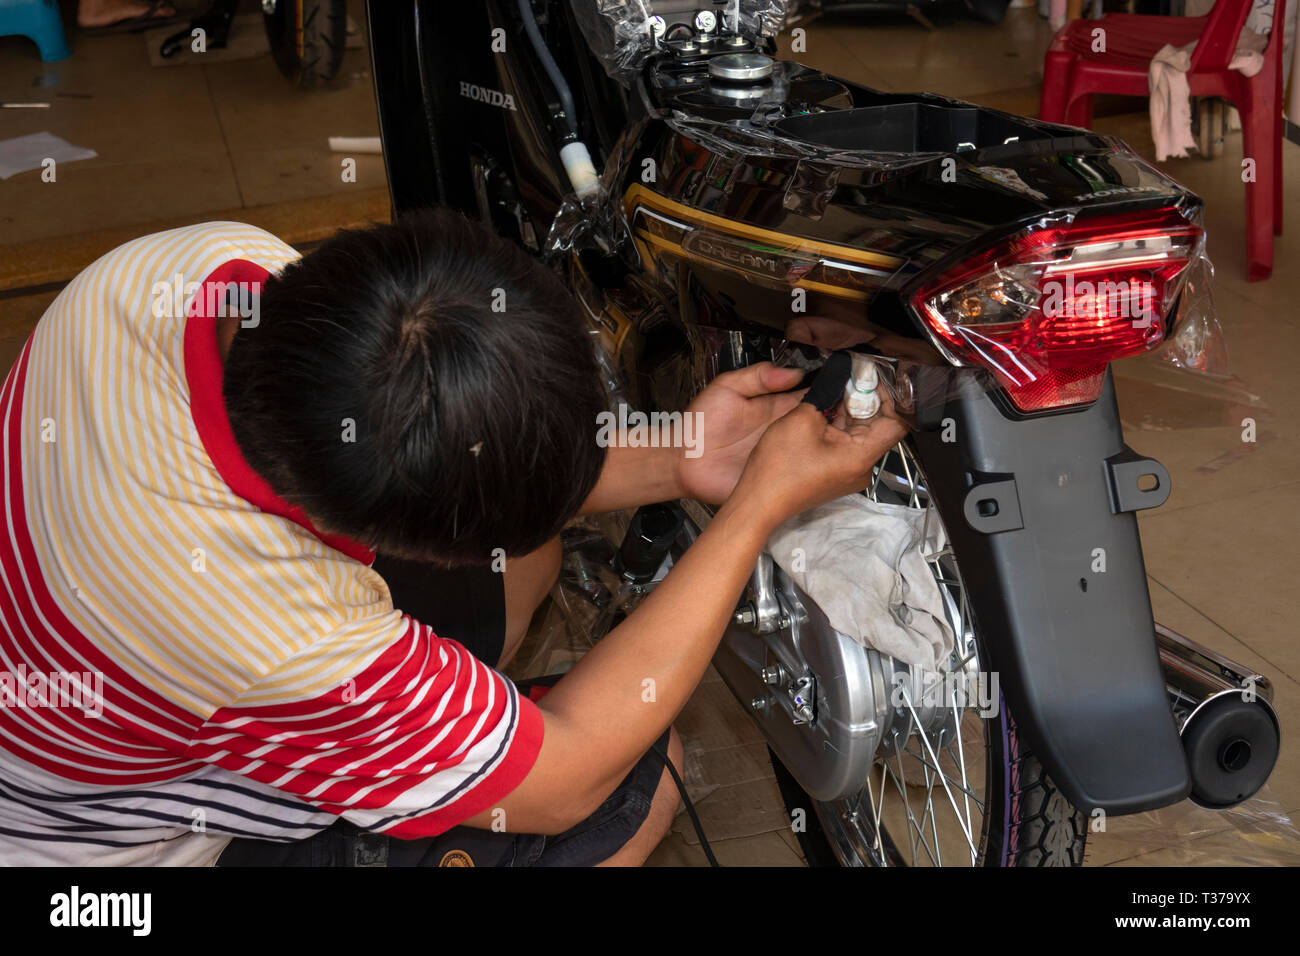 Camboya, Kampong (Kompong Cham), del centro de la ciudad, motocicleta showroom hombre aplicar calcas personalizadas a Honda Dream moto Foto de stock